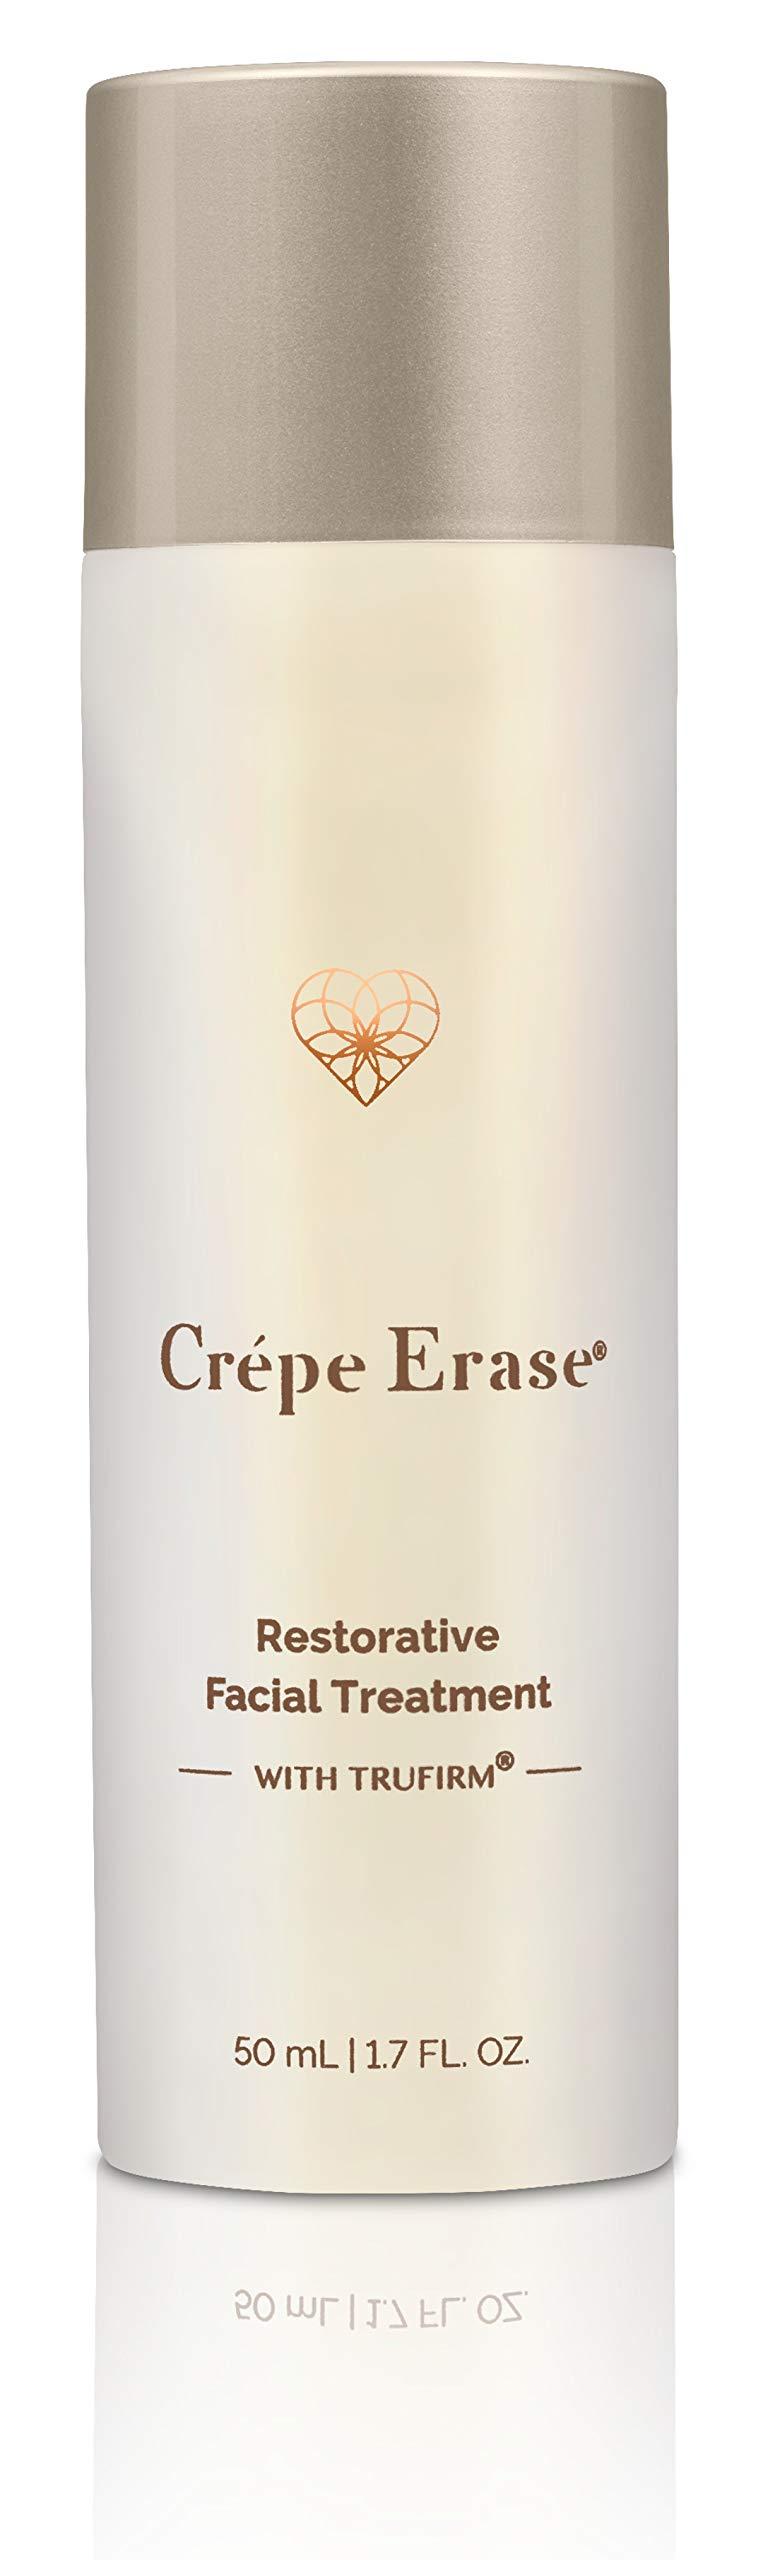 Crépe Erase Advanced - Restorative Facial Treatment with Trufirm Complex - Original Citrus Scent - Full Size/1.7 Ounces